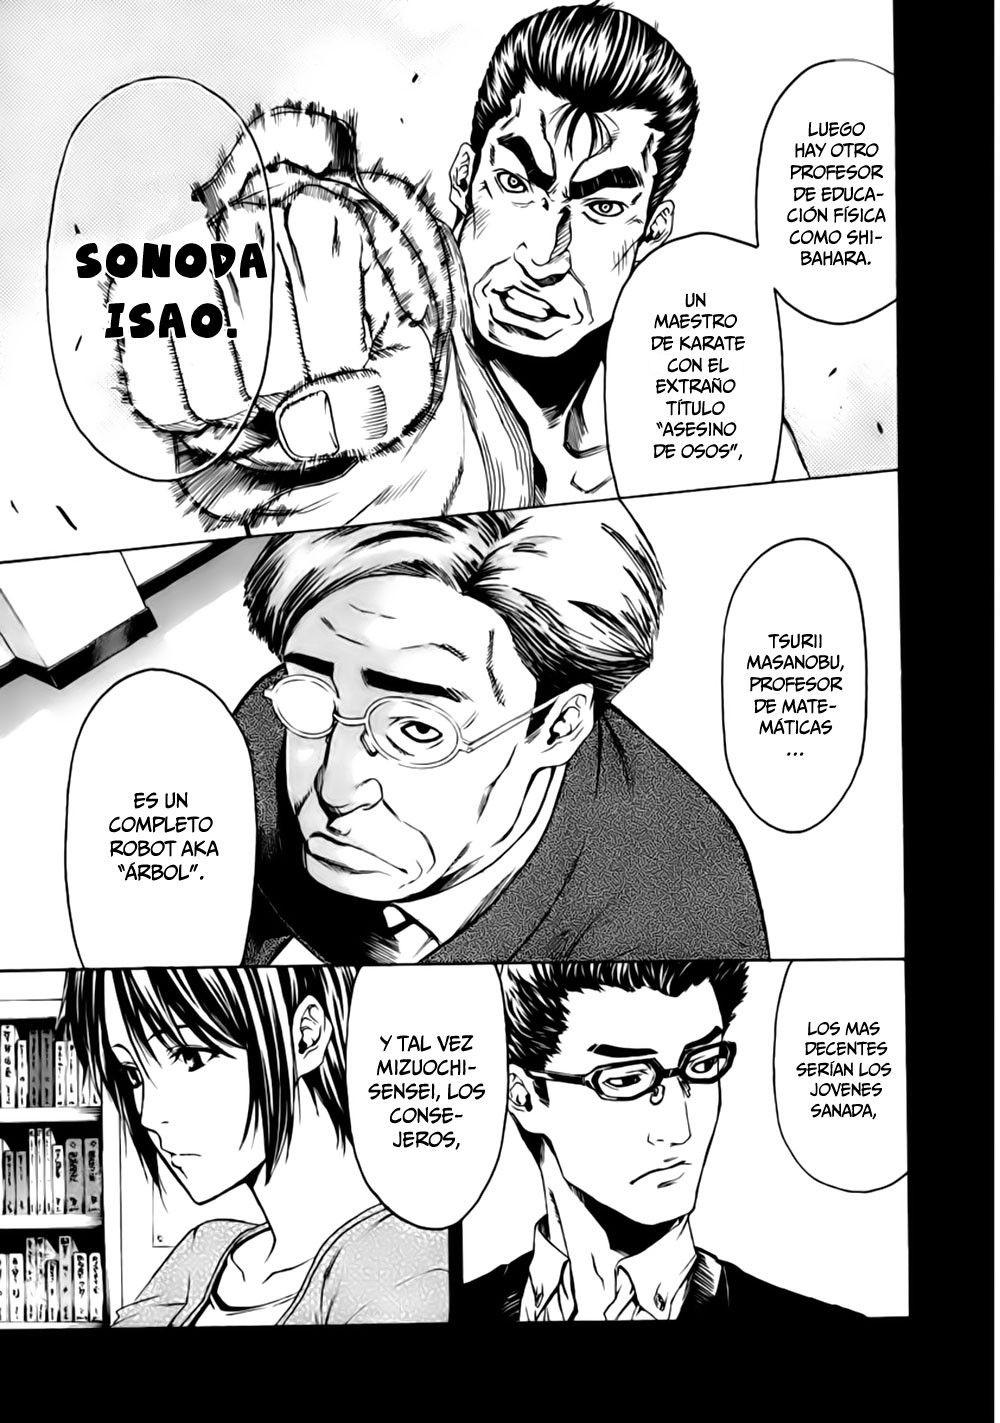 http://c5.ninemanga.com/es_manga/3/19523/460595/e5defb3b5d93915adfa5e4eccca0c249.jpg Page 16